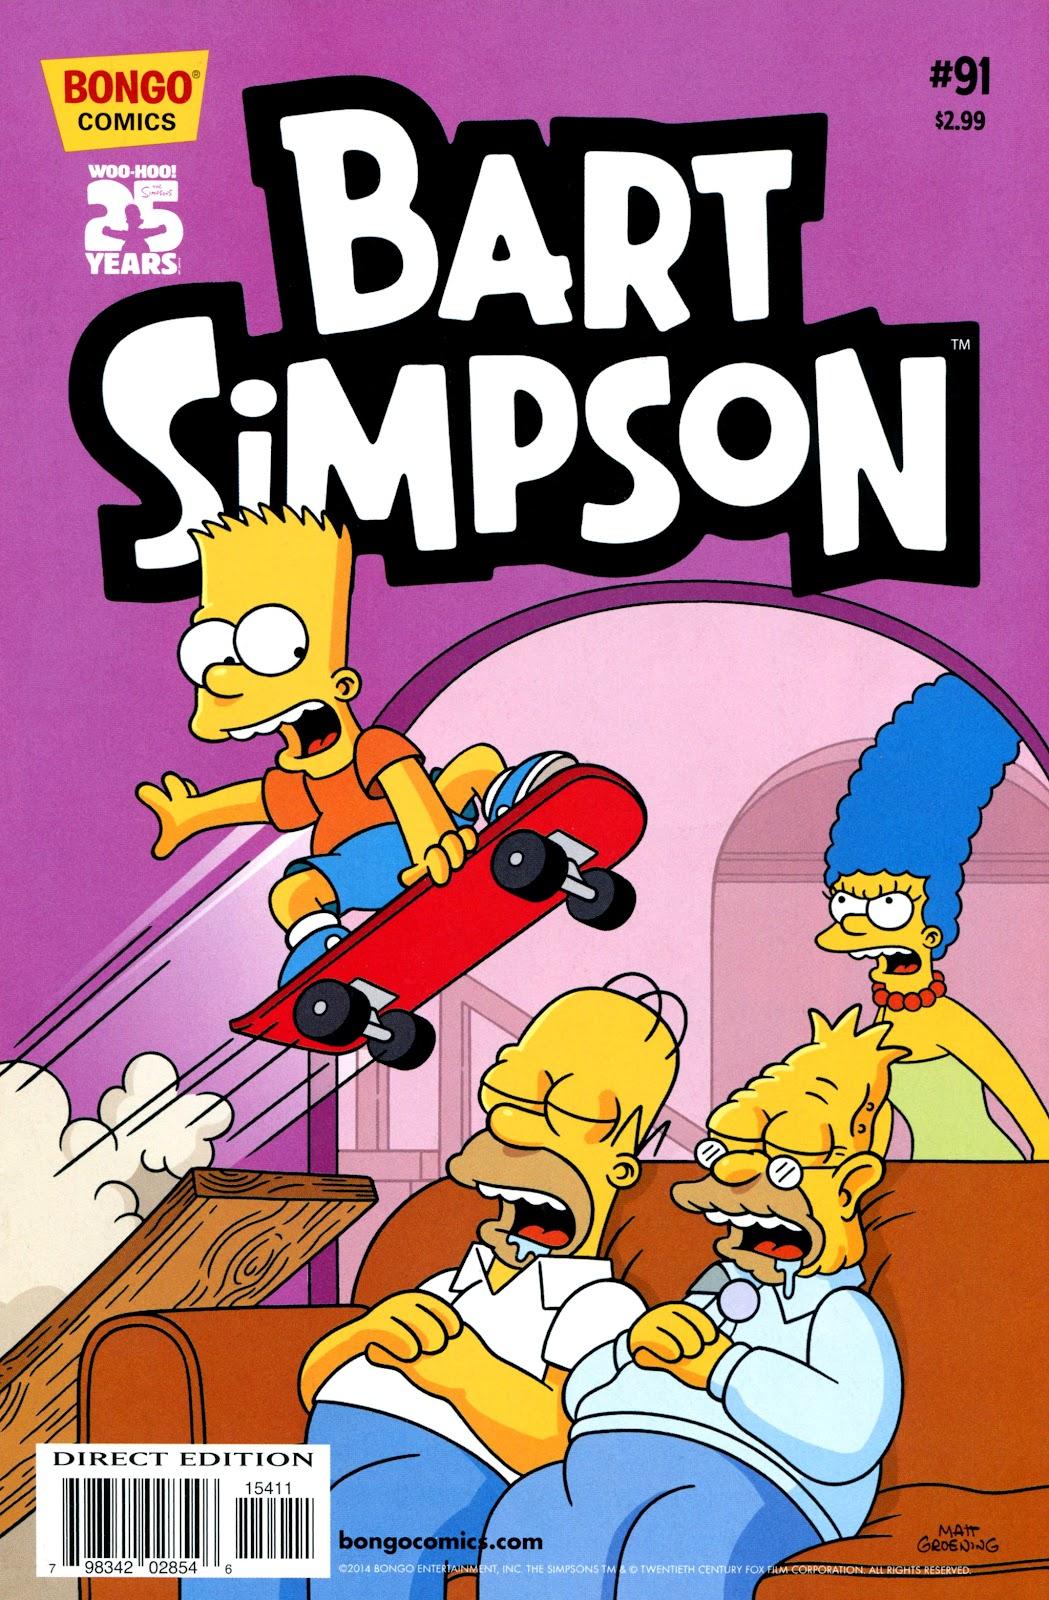 Simpsons Comics Presents Bart Simpson 91 Page 1